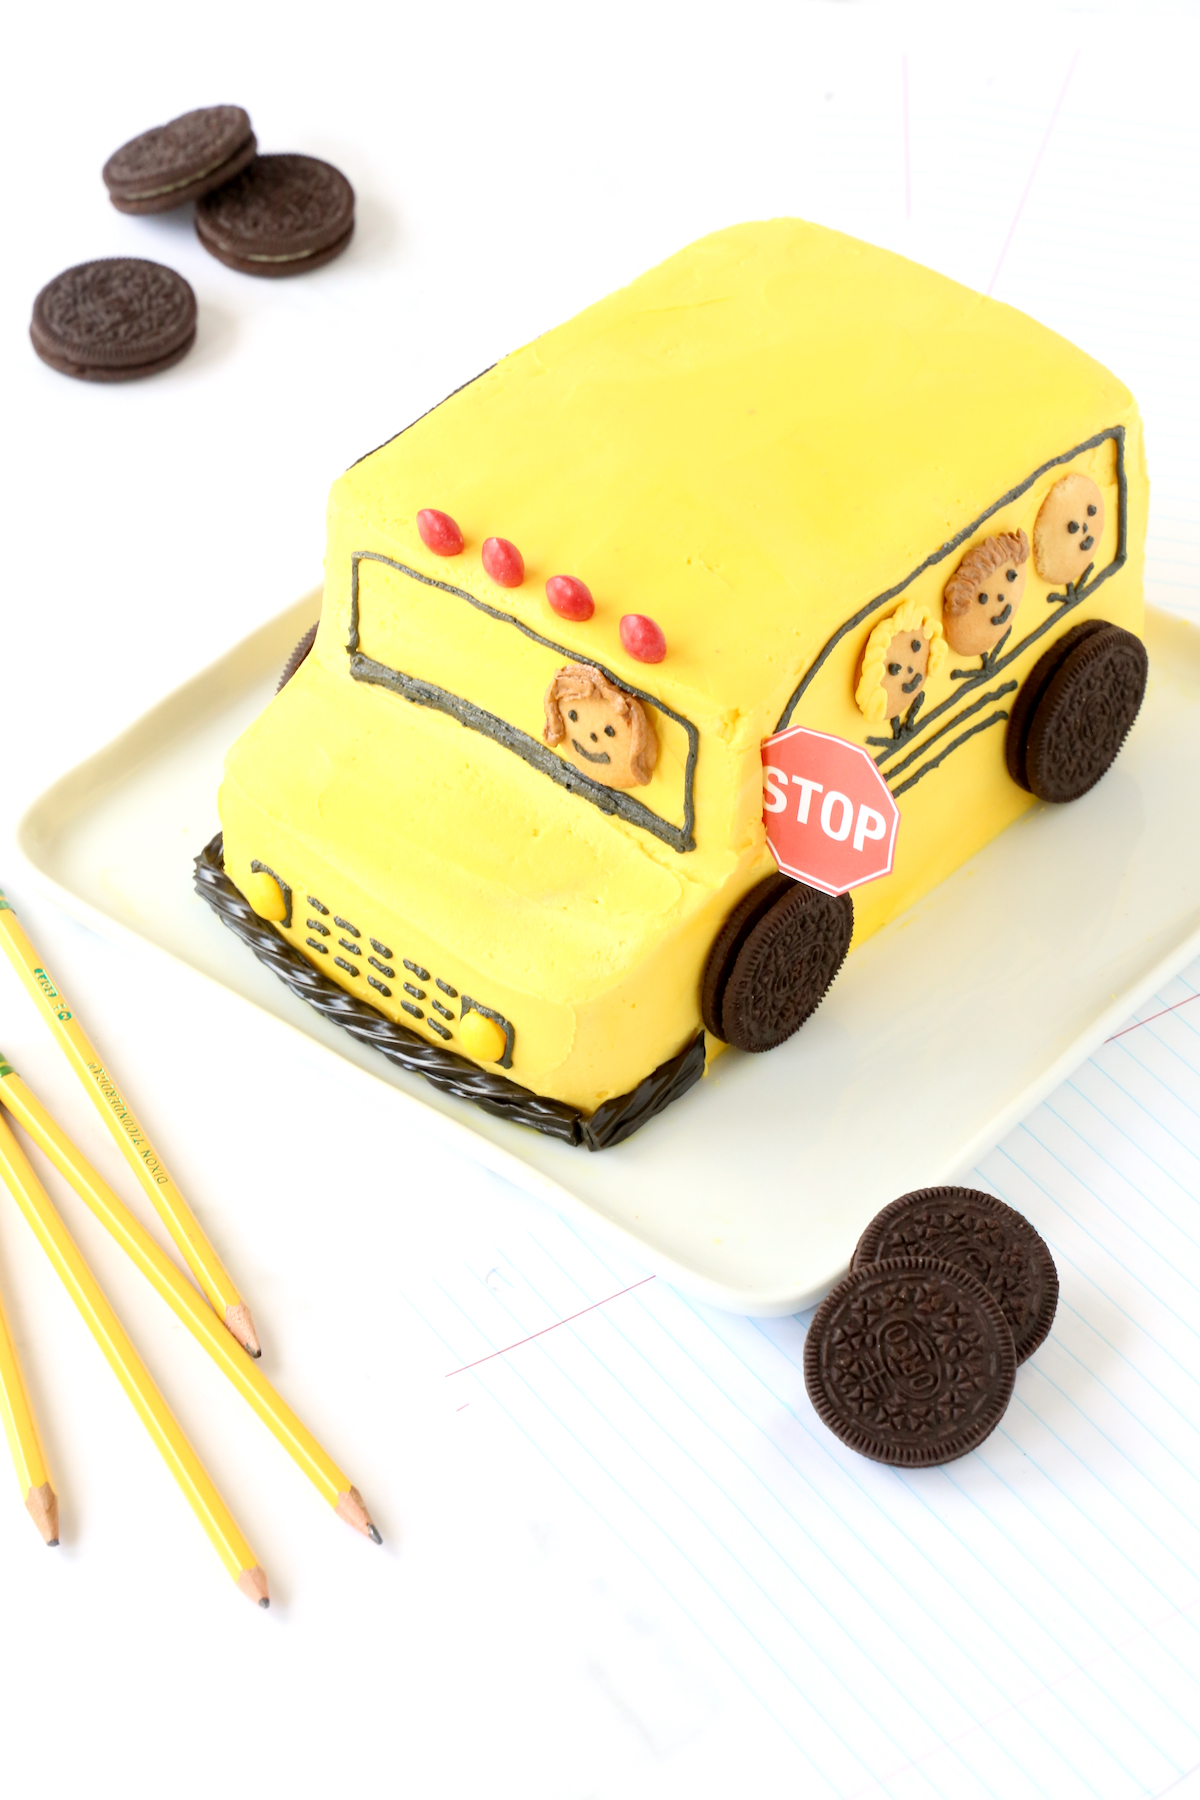 back to school dessert